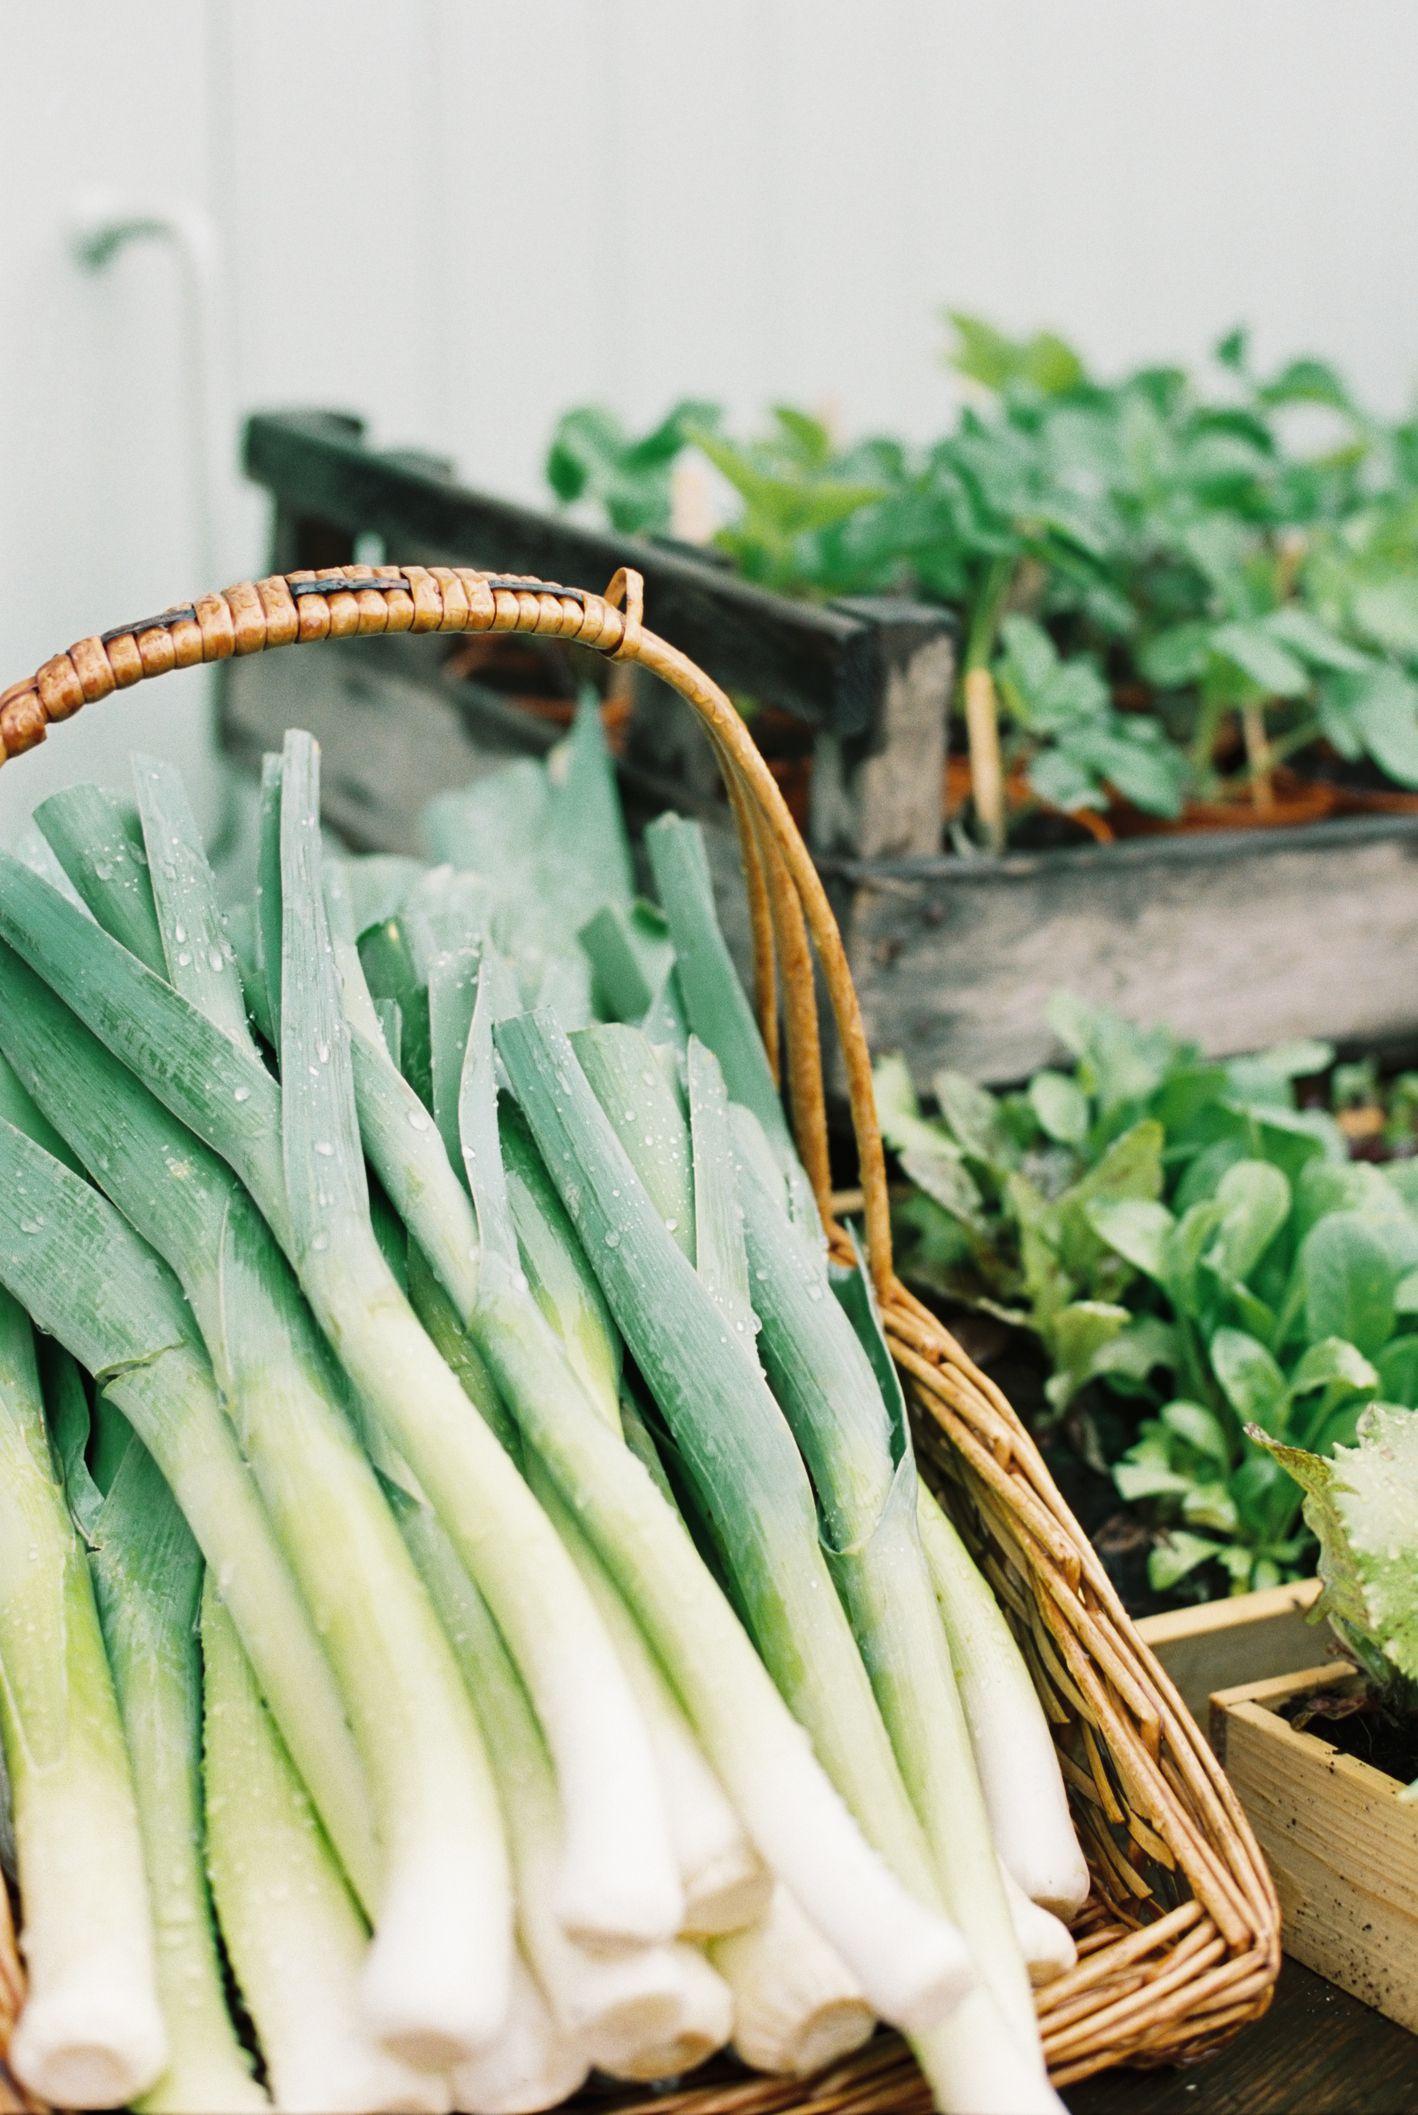 How To Grow Leeks In The Home Vegetable Garden